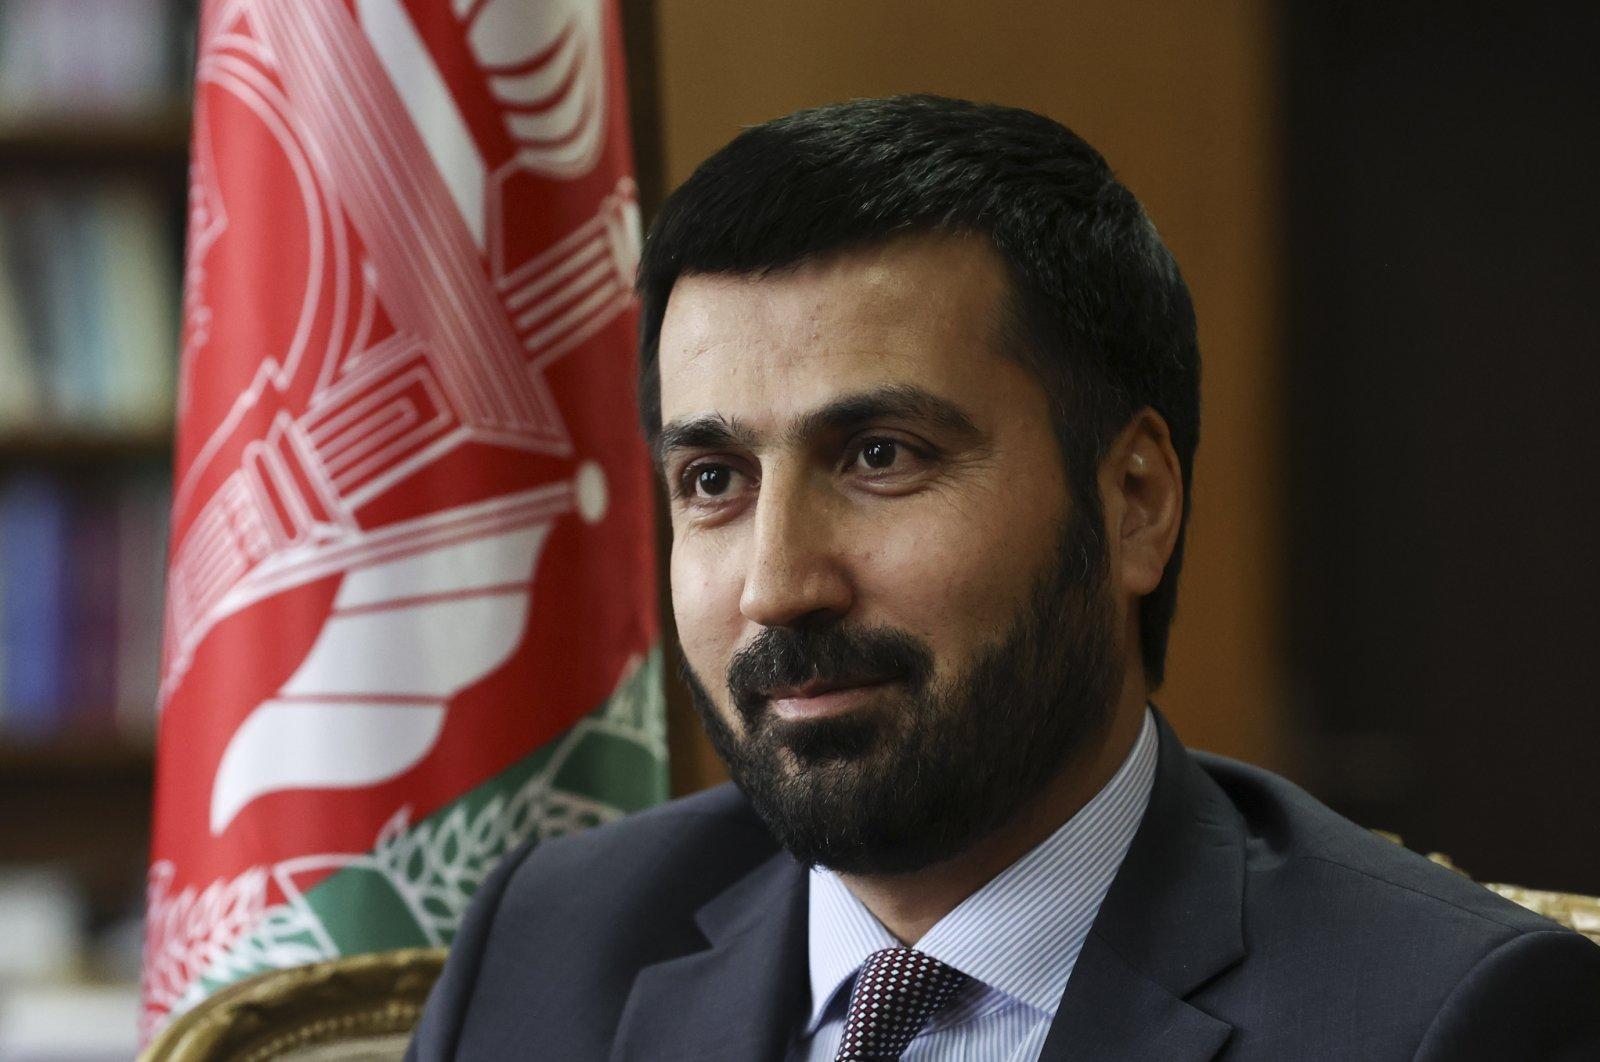 Amir Mohammad Ramin, Afghanistan's ambassador to Turkey, speaks to the Anadolu Agency (AA) in the capital Ankara, Turkey, March 26, 2021. (AA Photo)